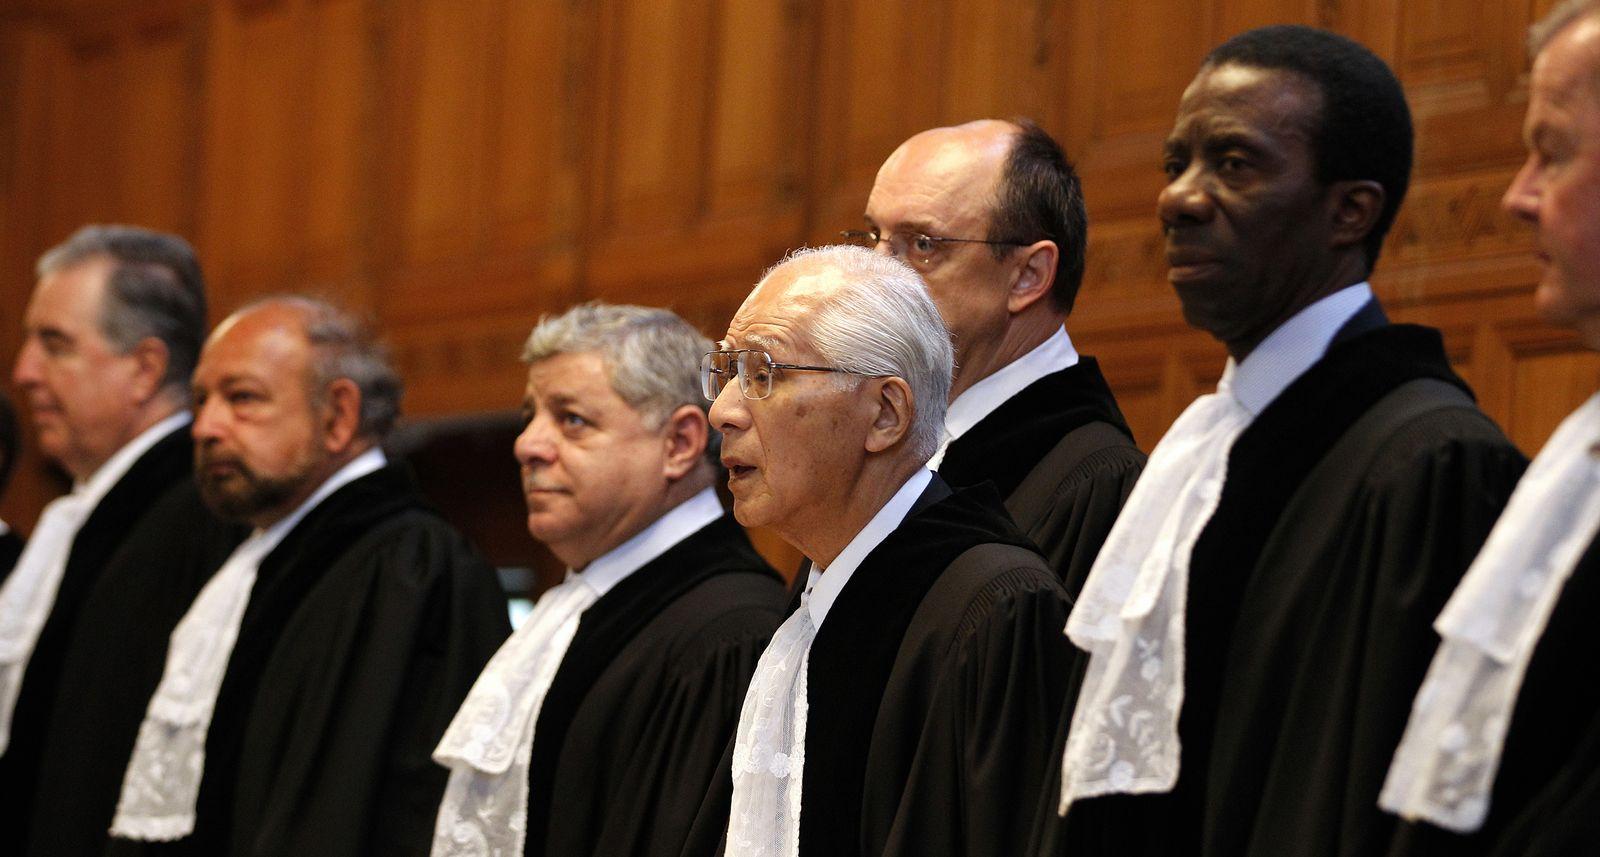 Netherlands World Court Germany Italy